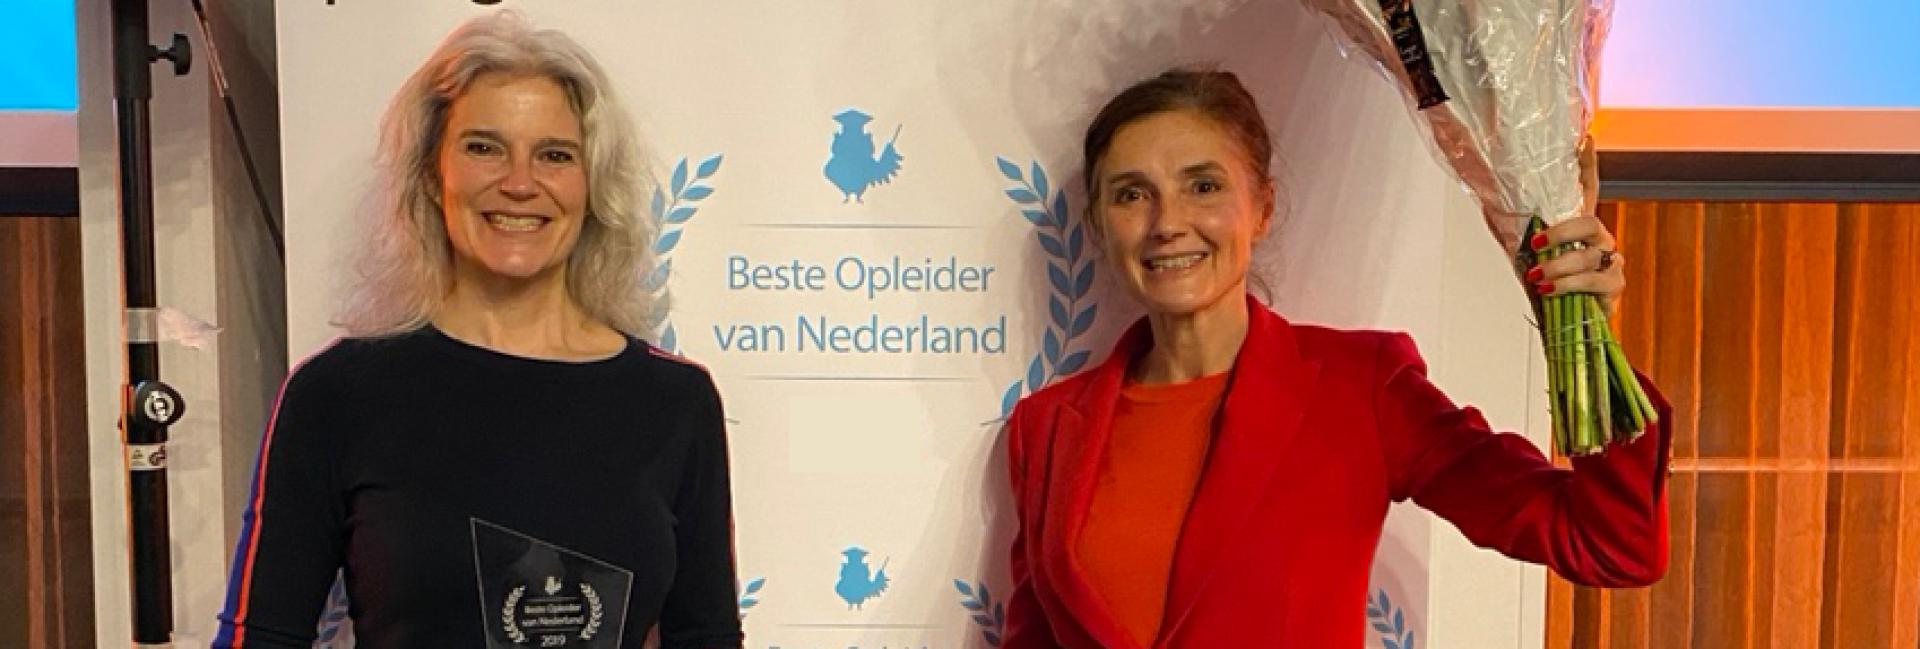 Alfabeta Beste Opleider van Nederland